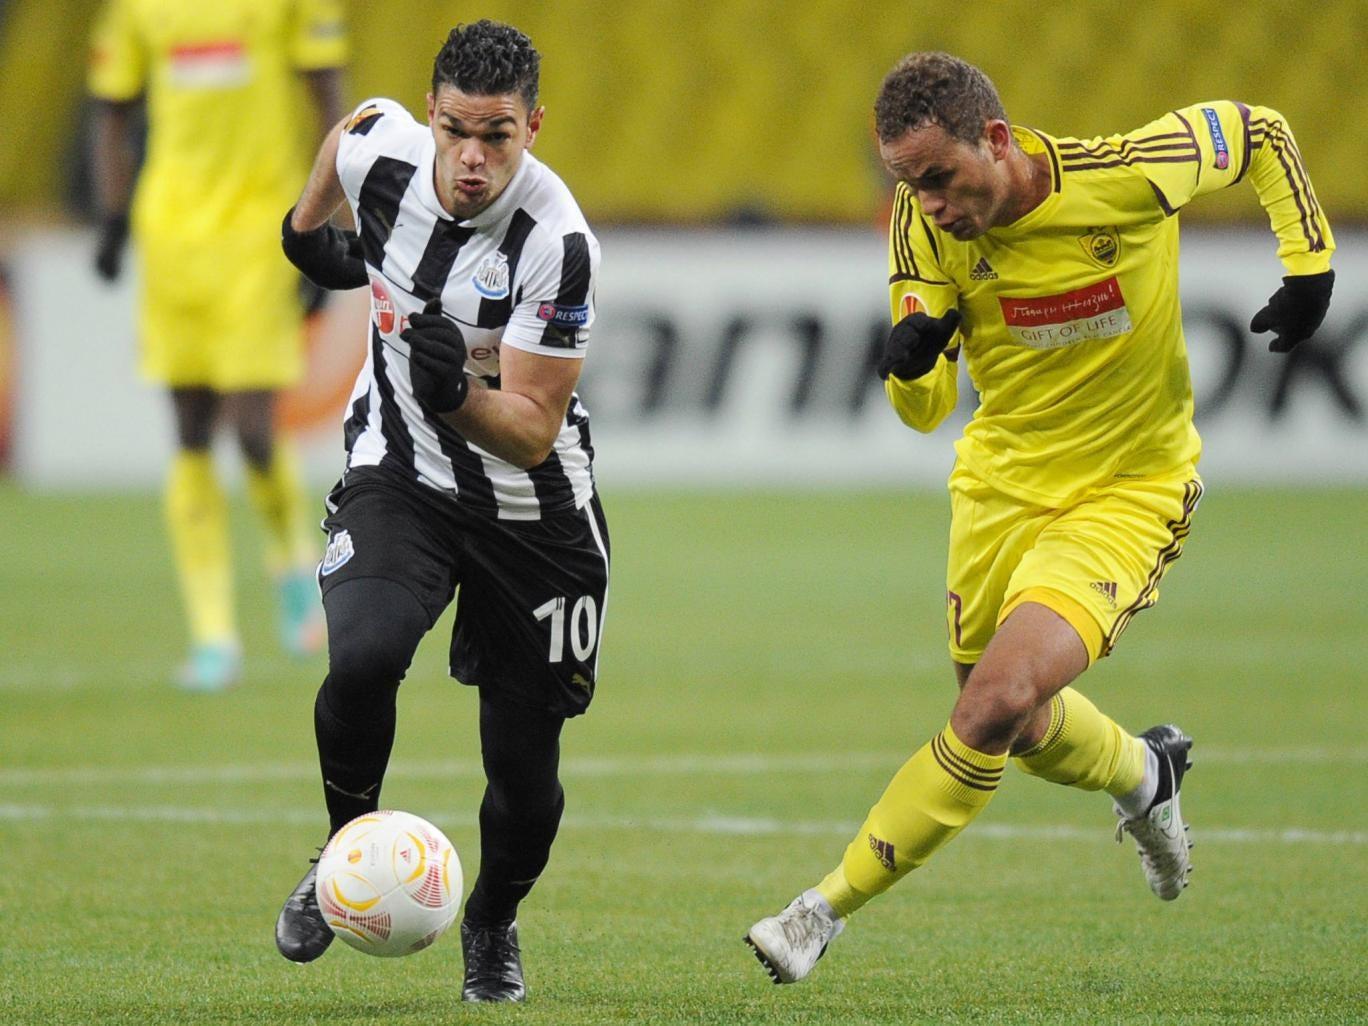 Newcastle midfielder Hatem Ben Arfa in Europa League action against Anzhi Makhachkala